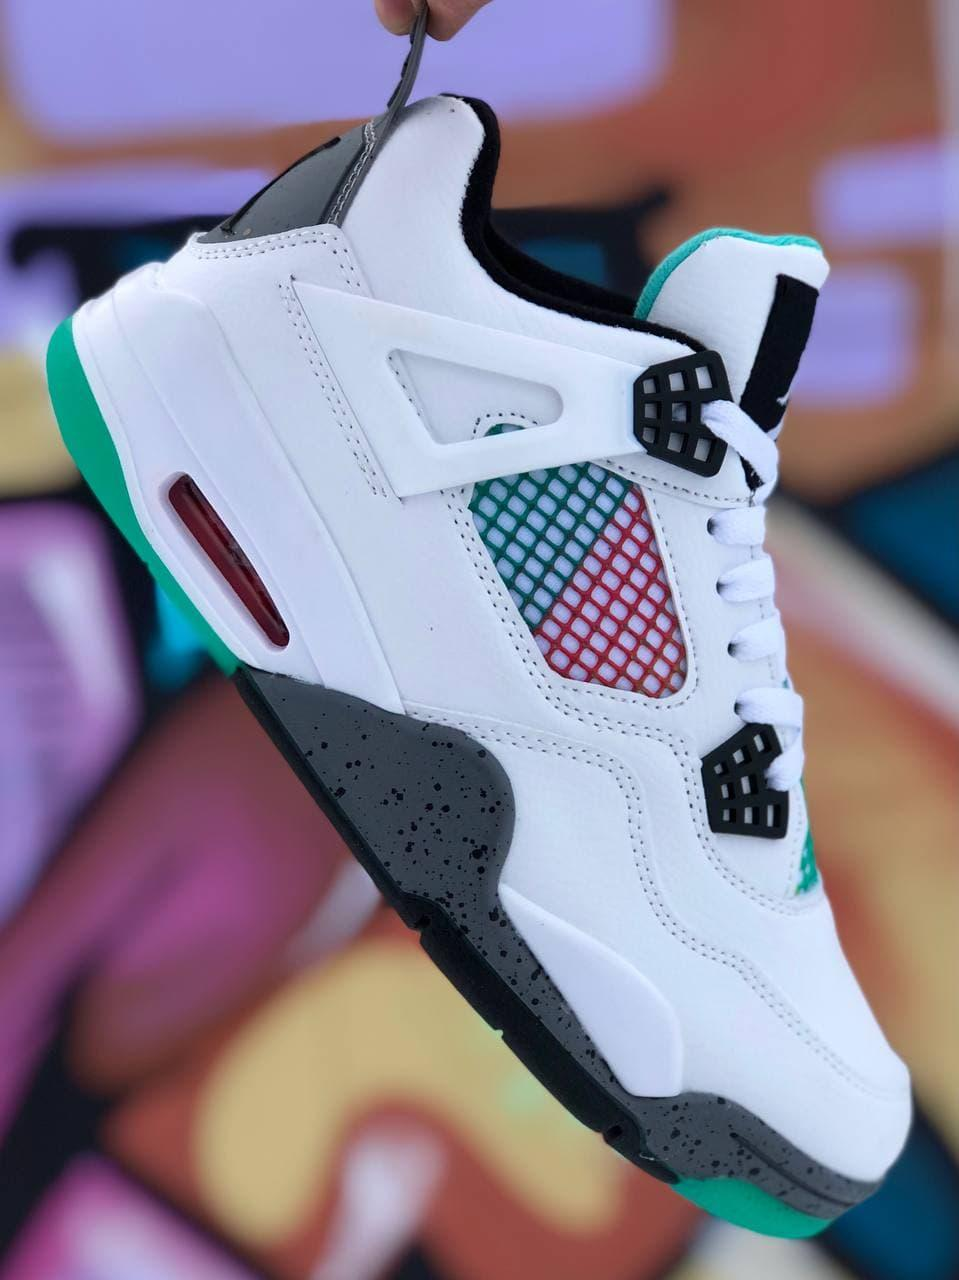 Кроссовки  в стиле N1ke Air Jordan белые 40-44